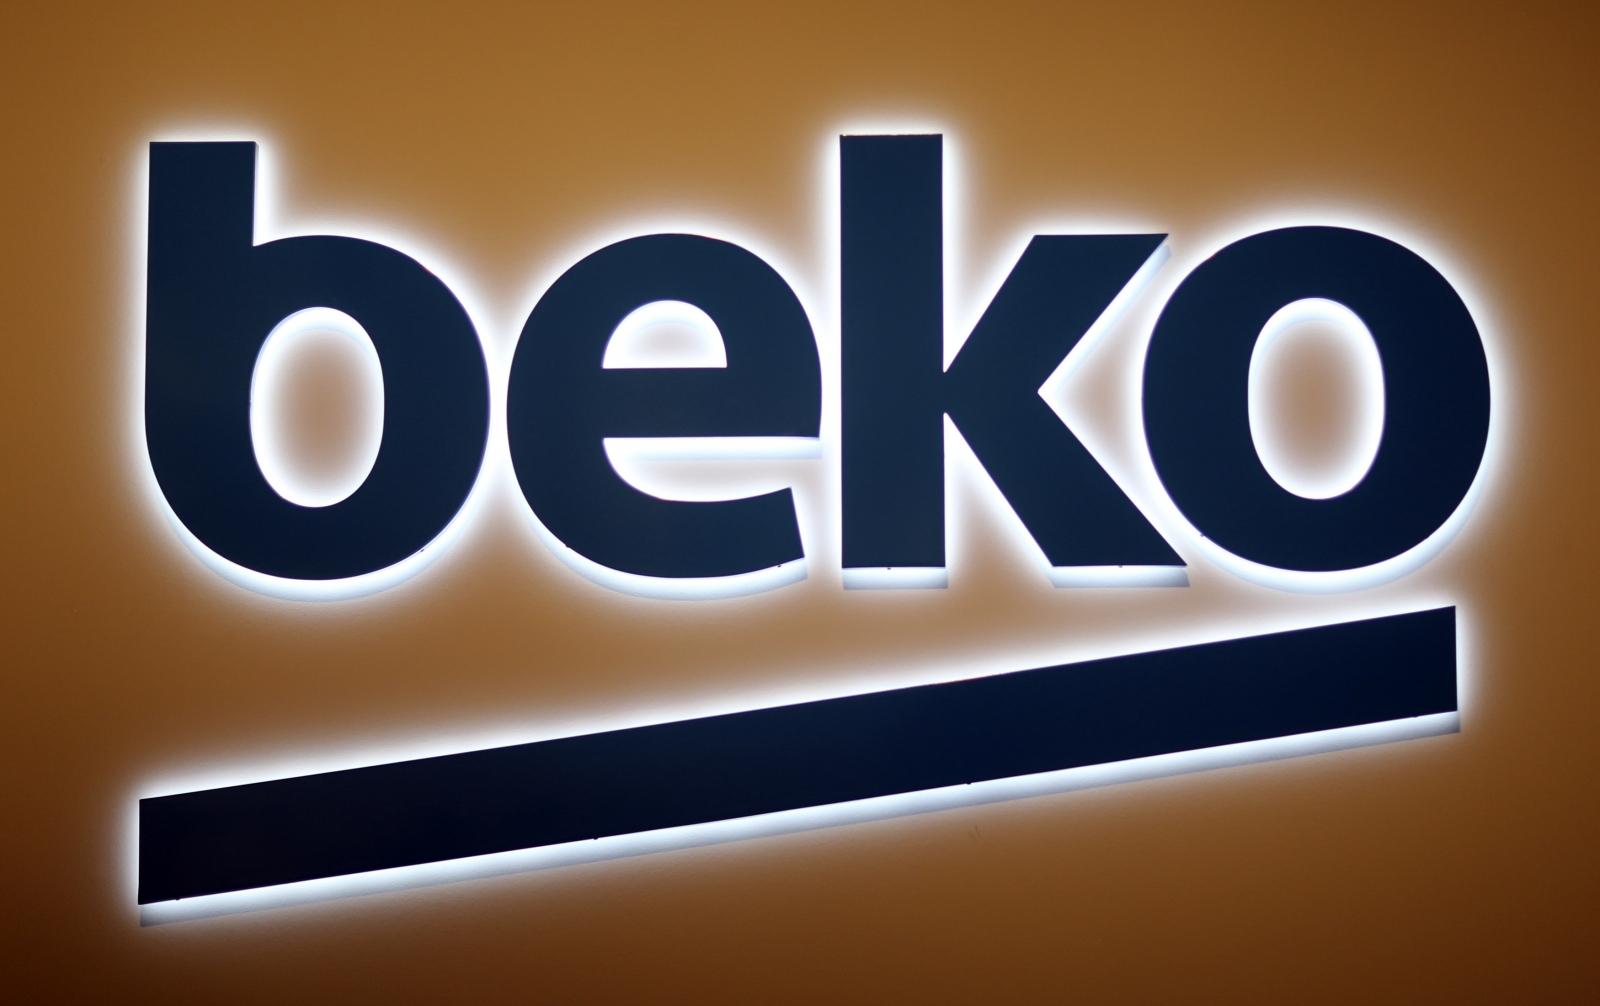 Beko logo domestic appliances